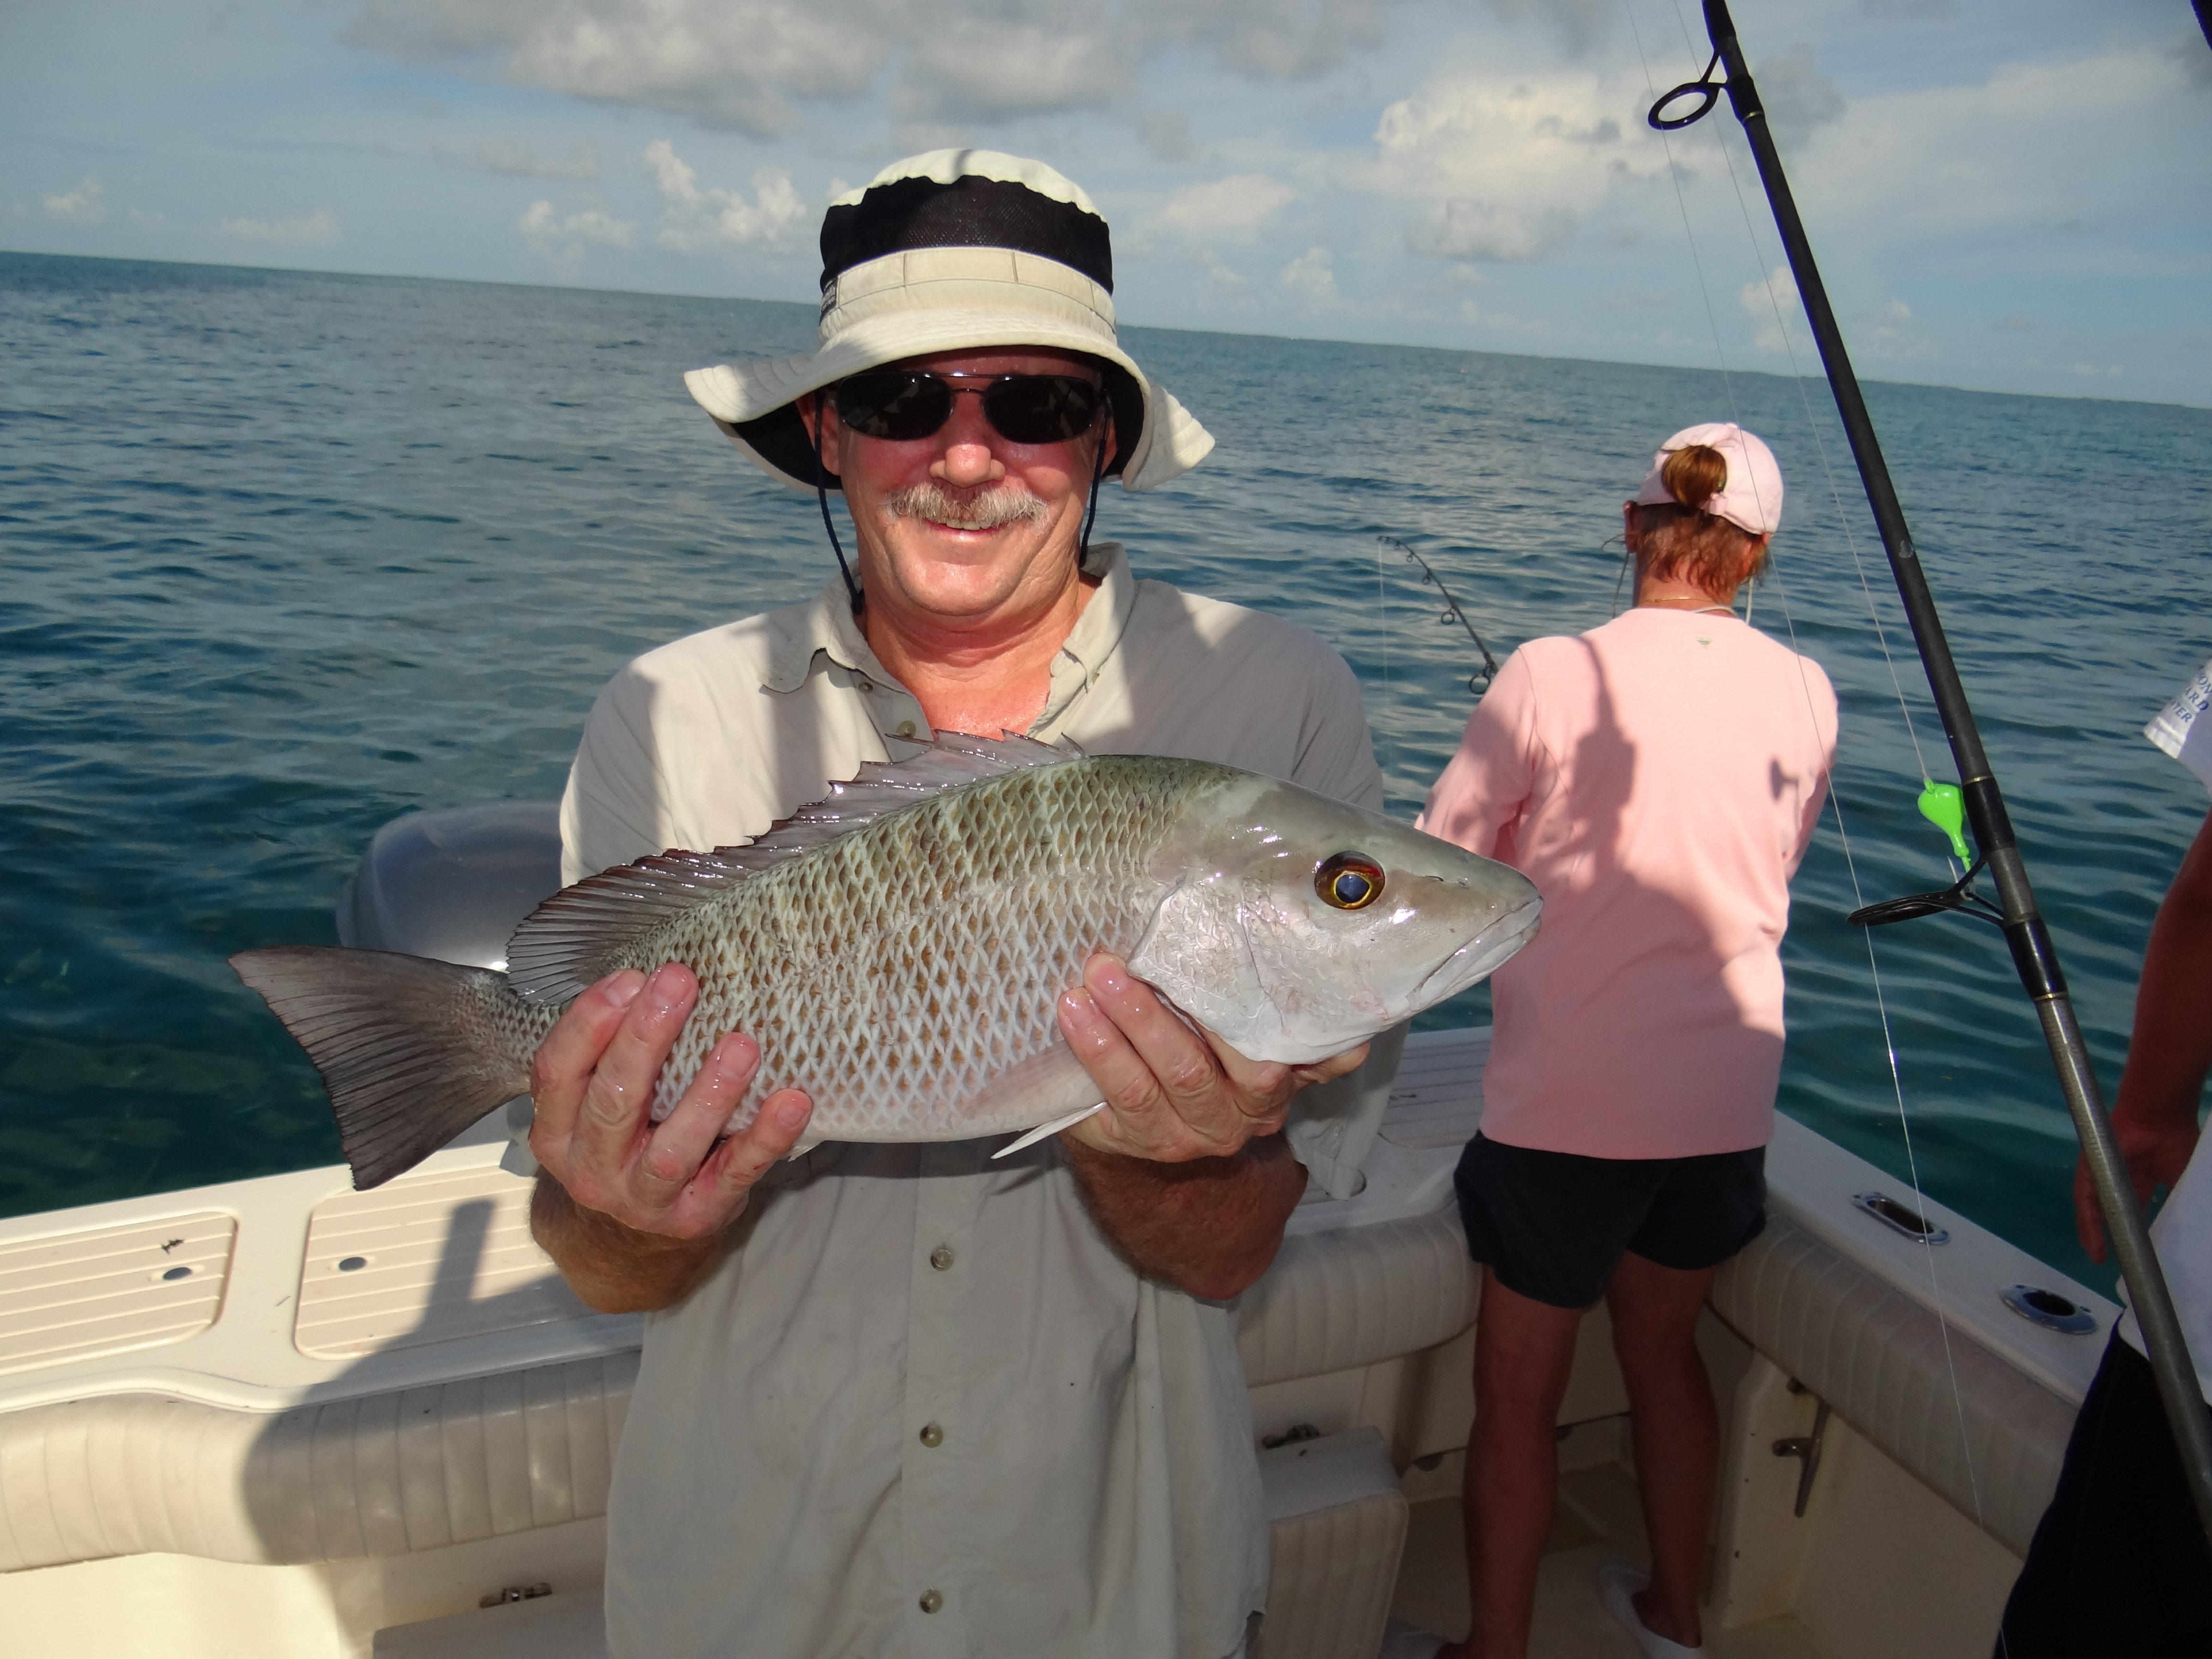 Cero mackerel seasquared charters for Fishing marathon fl